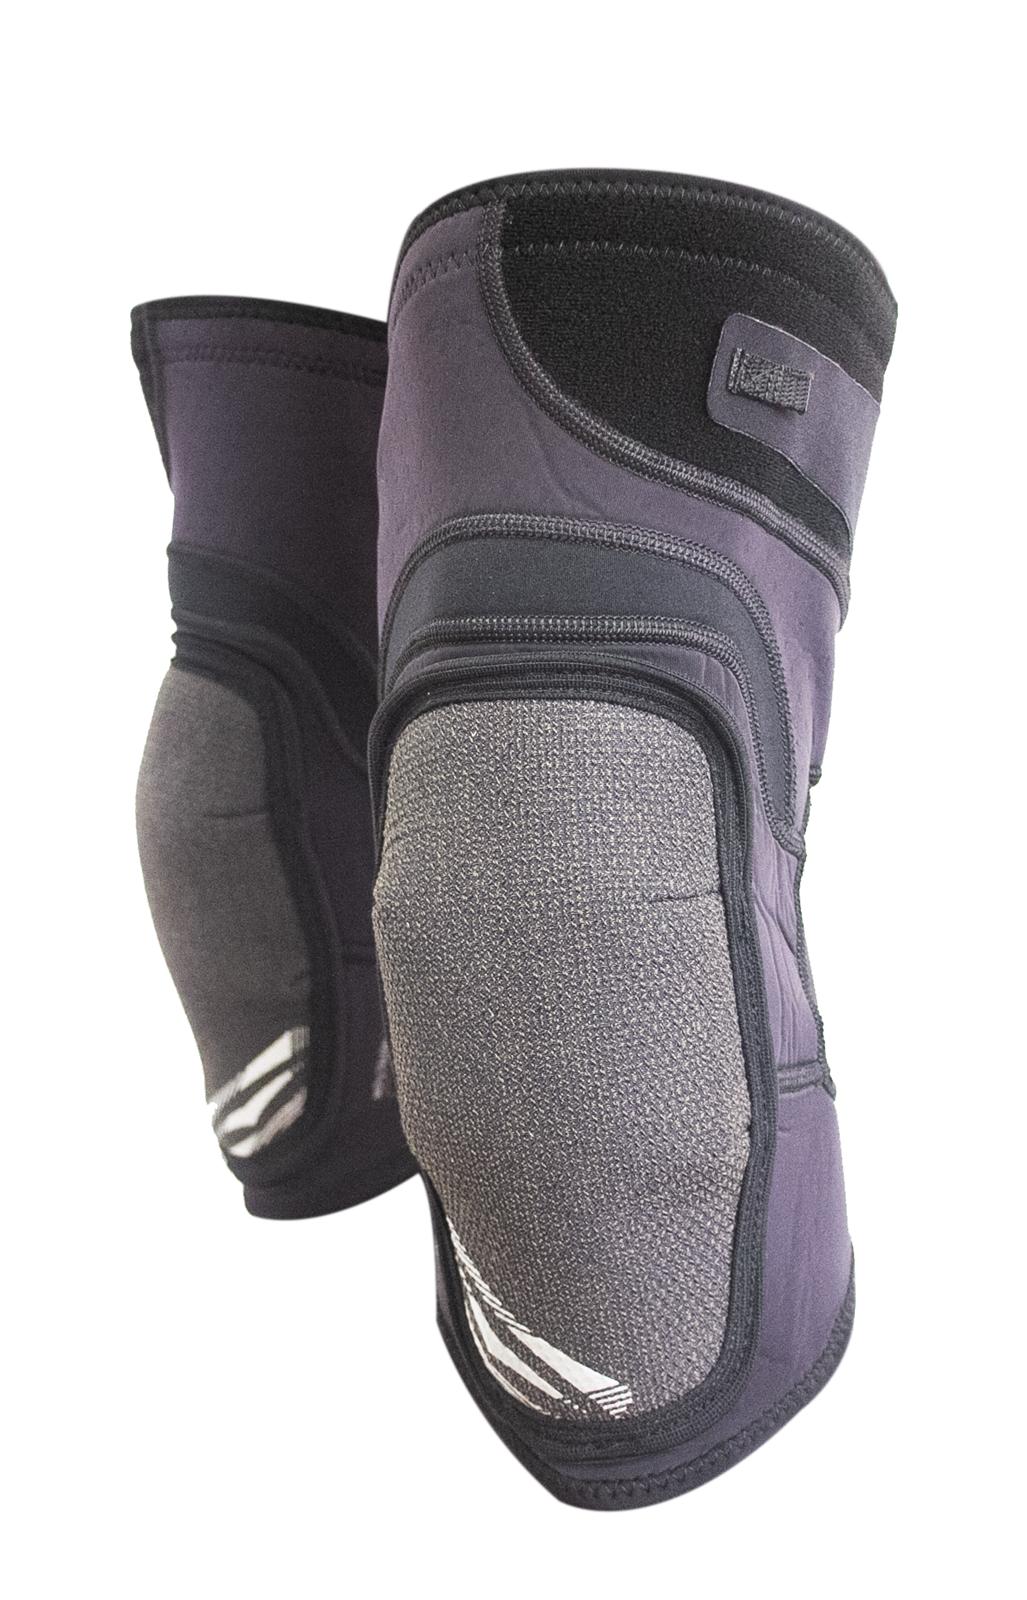 chrániče kolen a neoprenu Gul Elite Knee Pads - L